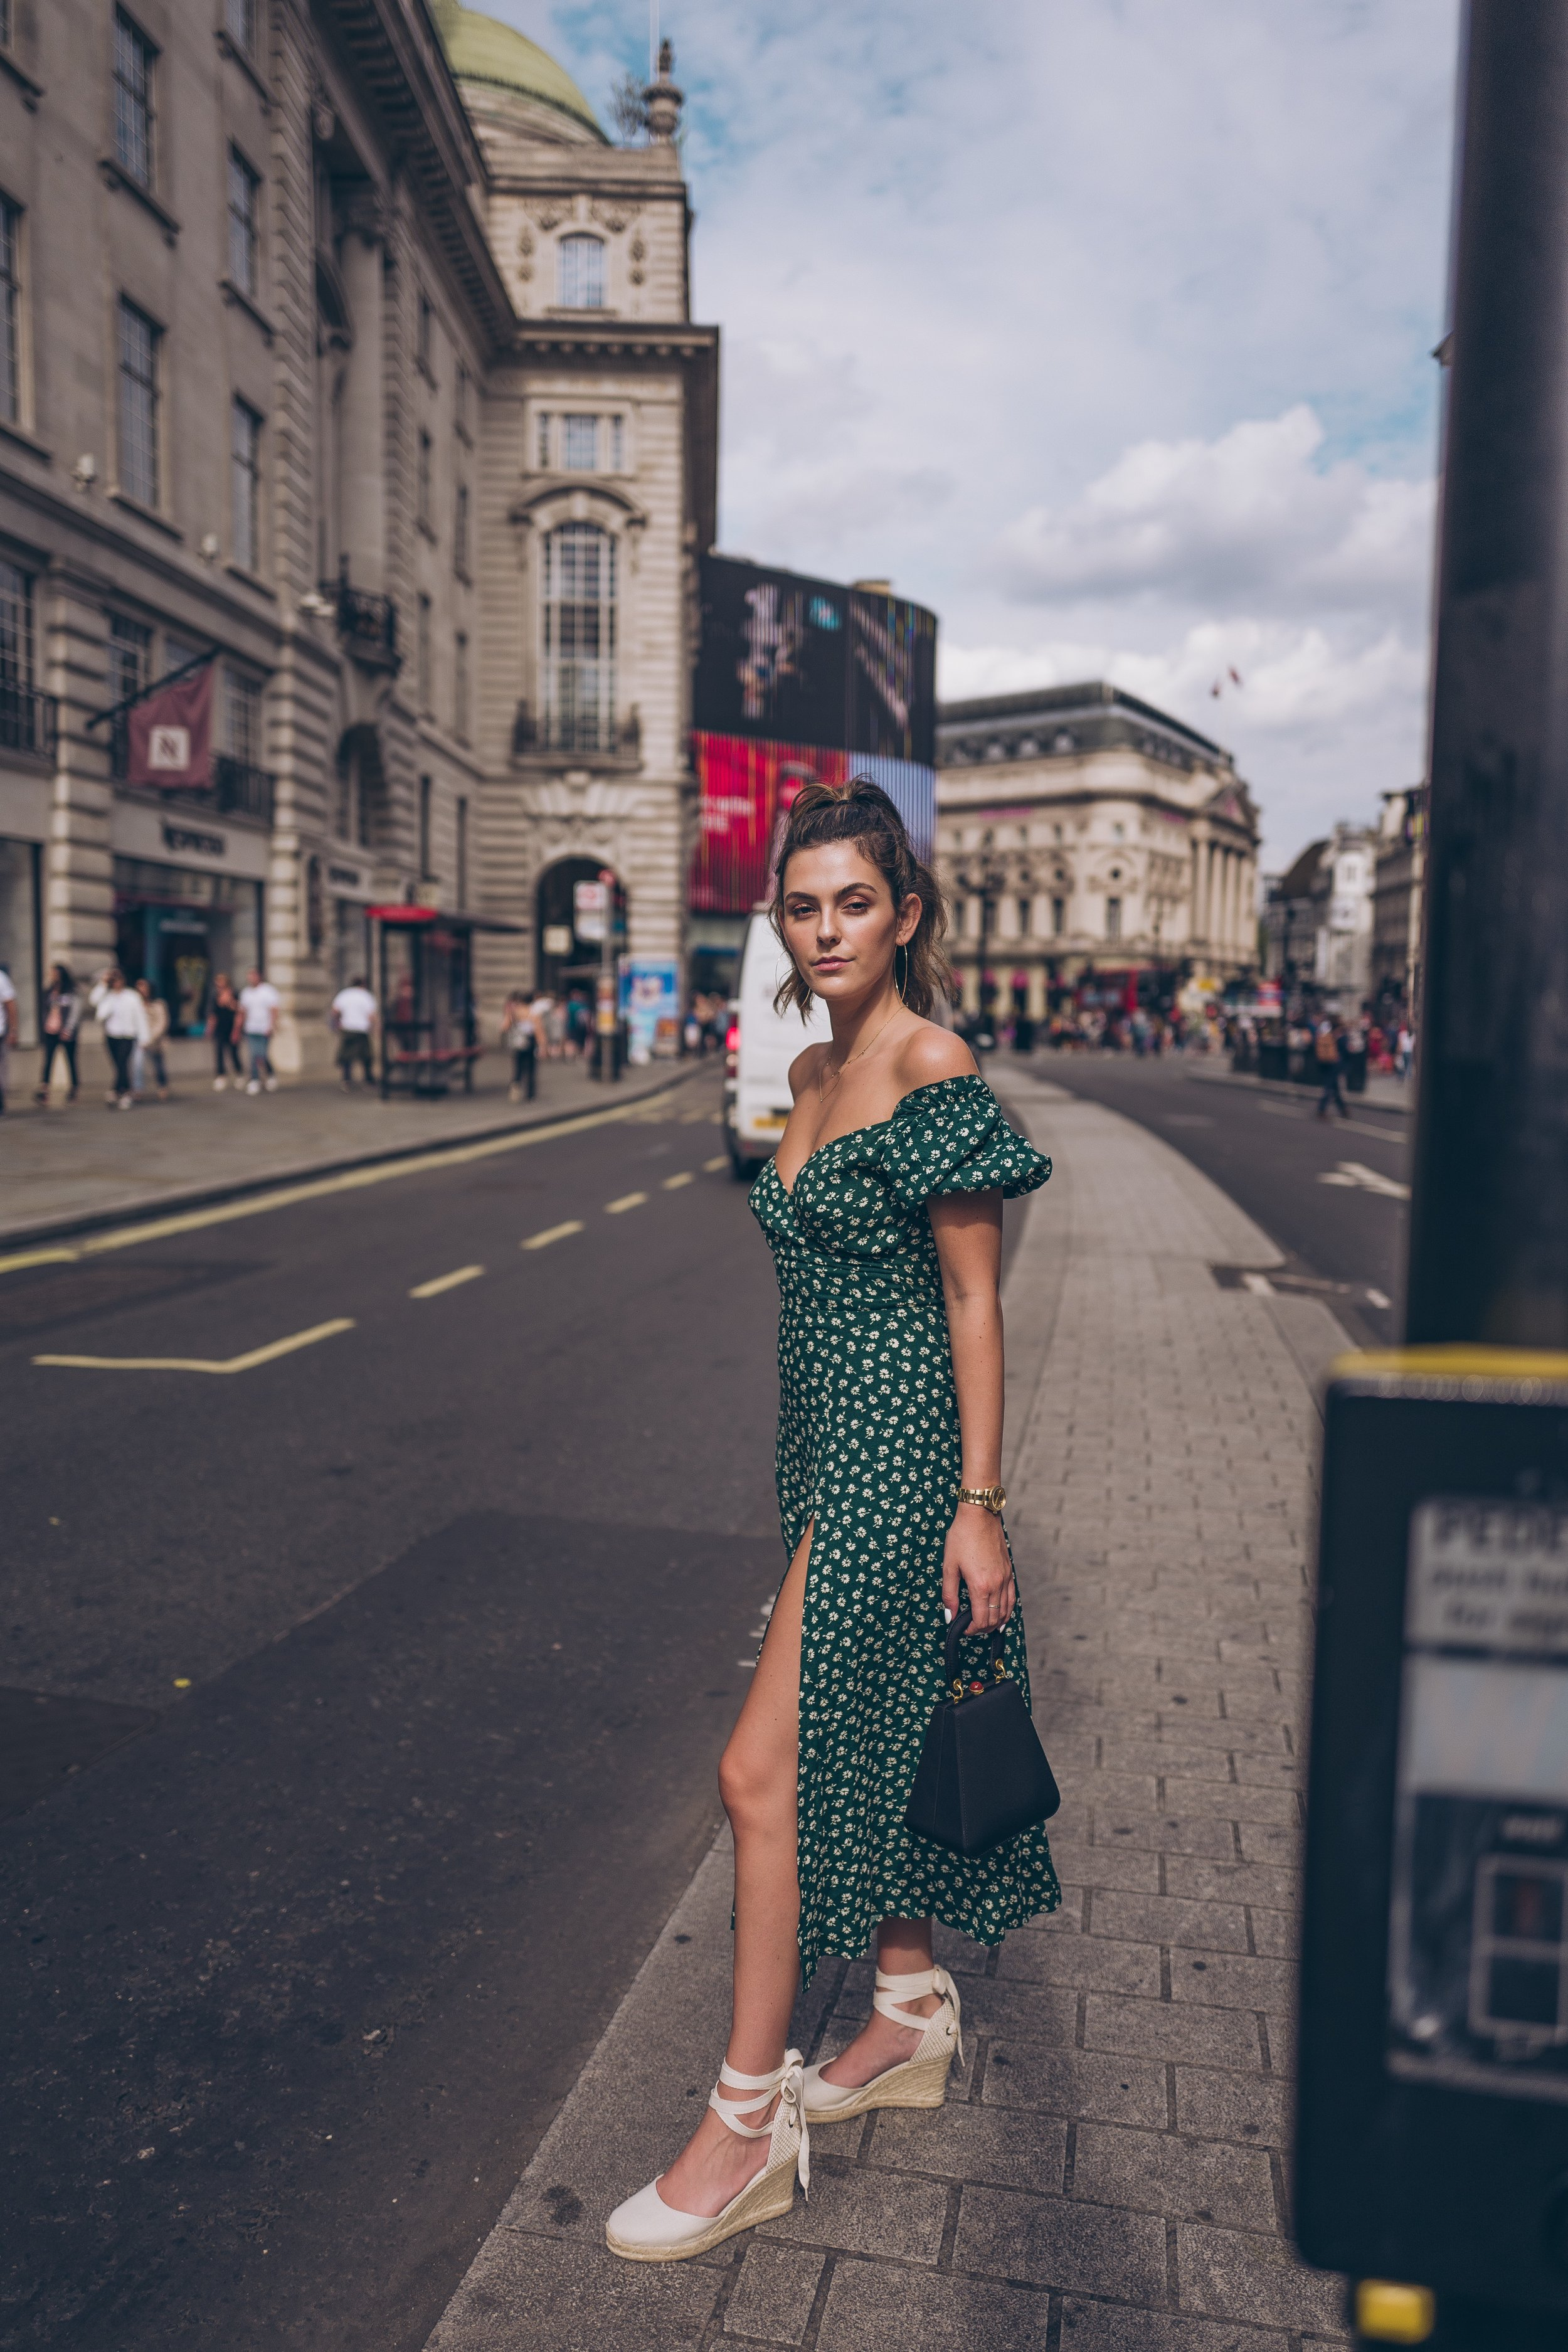 Julia Friedman piccadilly circus London reformation dress